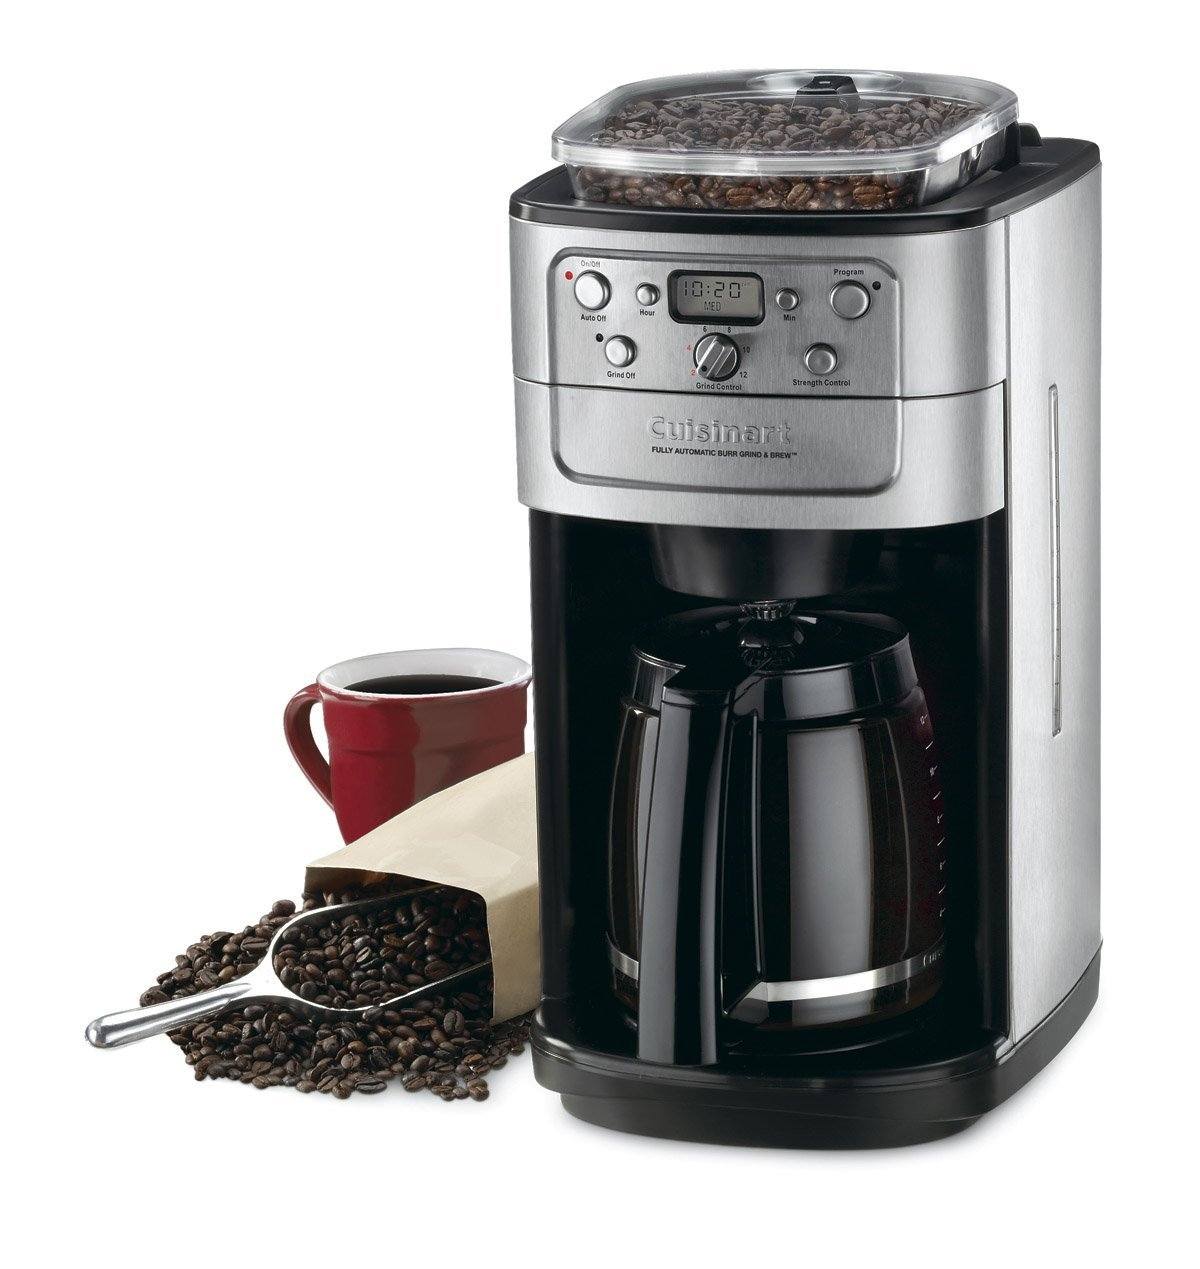 Cuisinart (DGB-700BC) 12 Cup Grind & Brew Coffeemaker